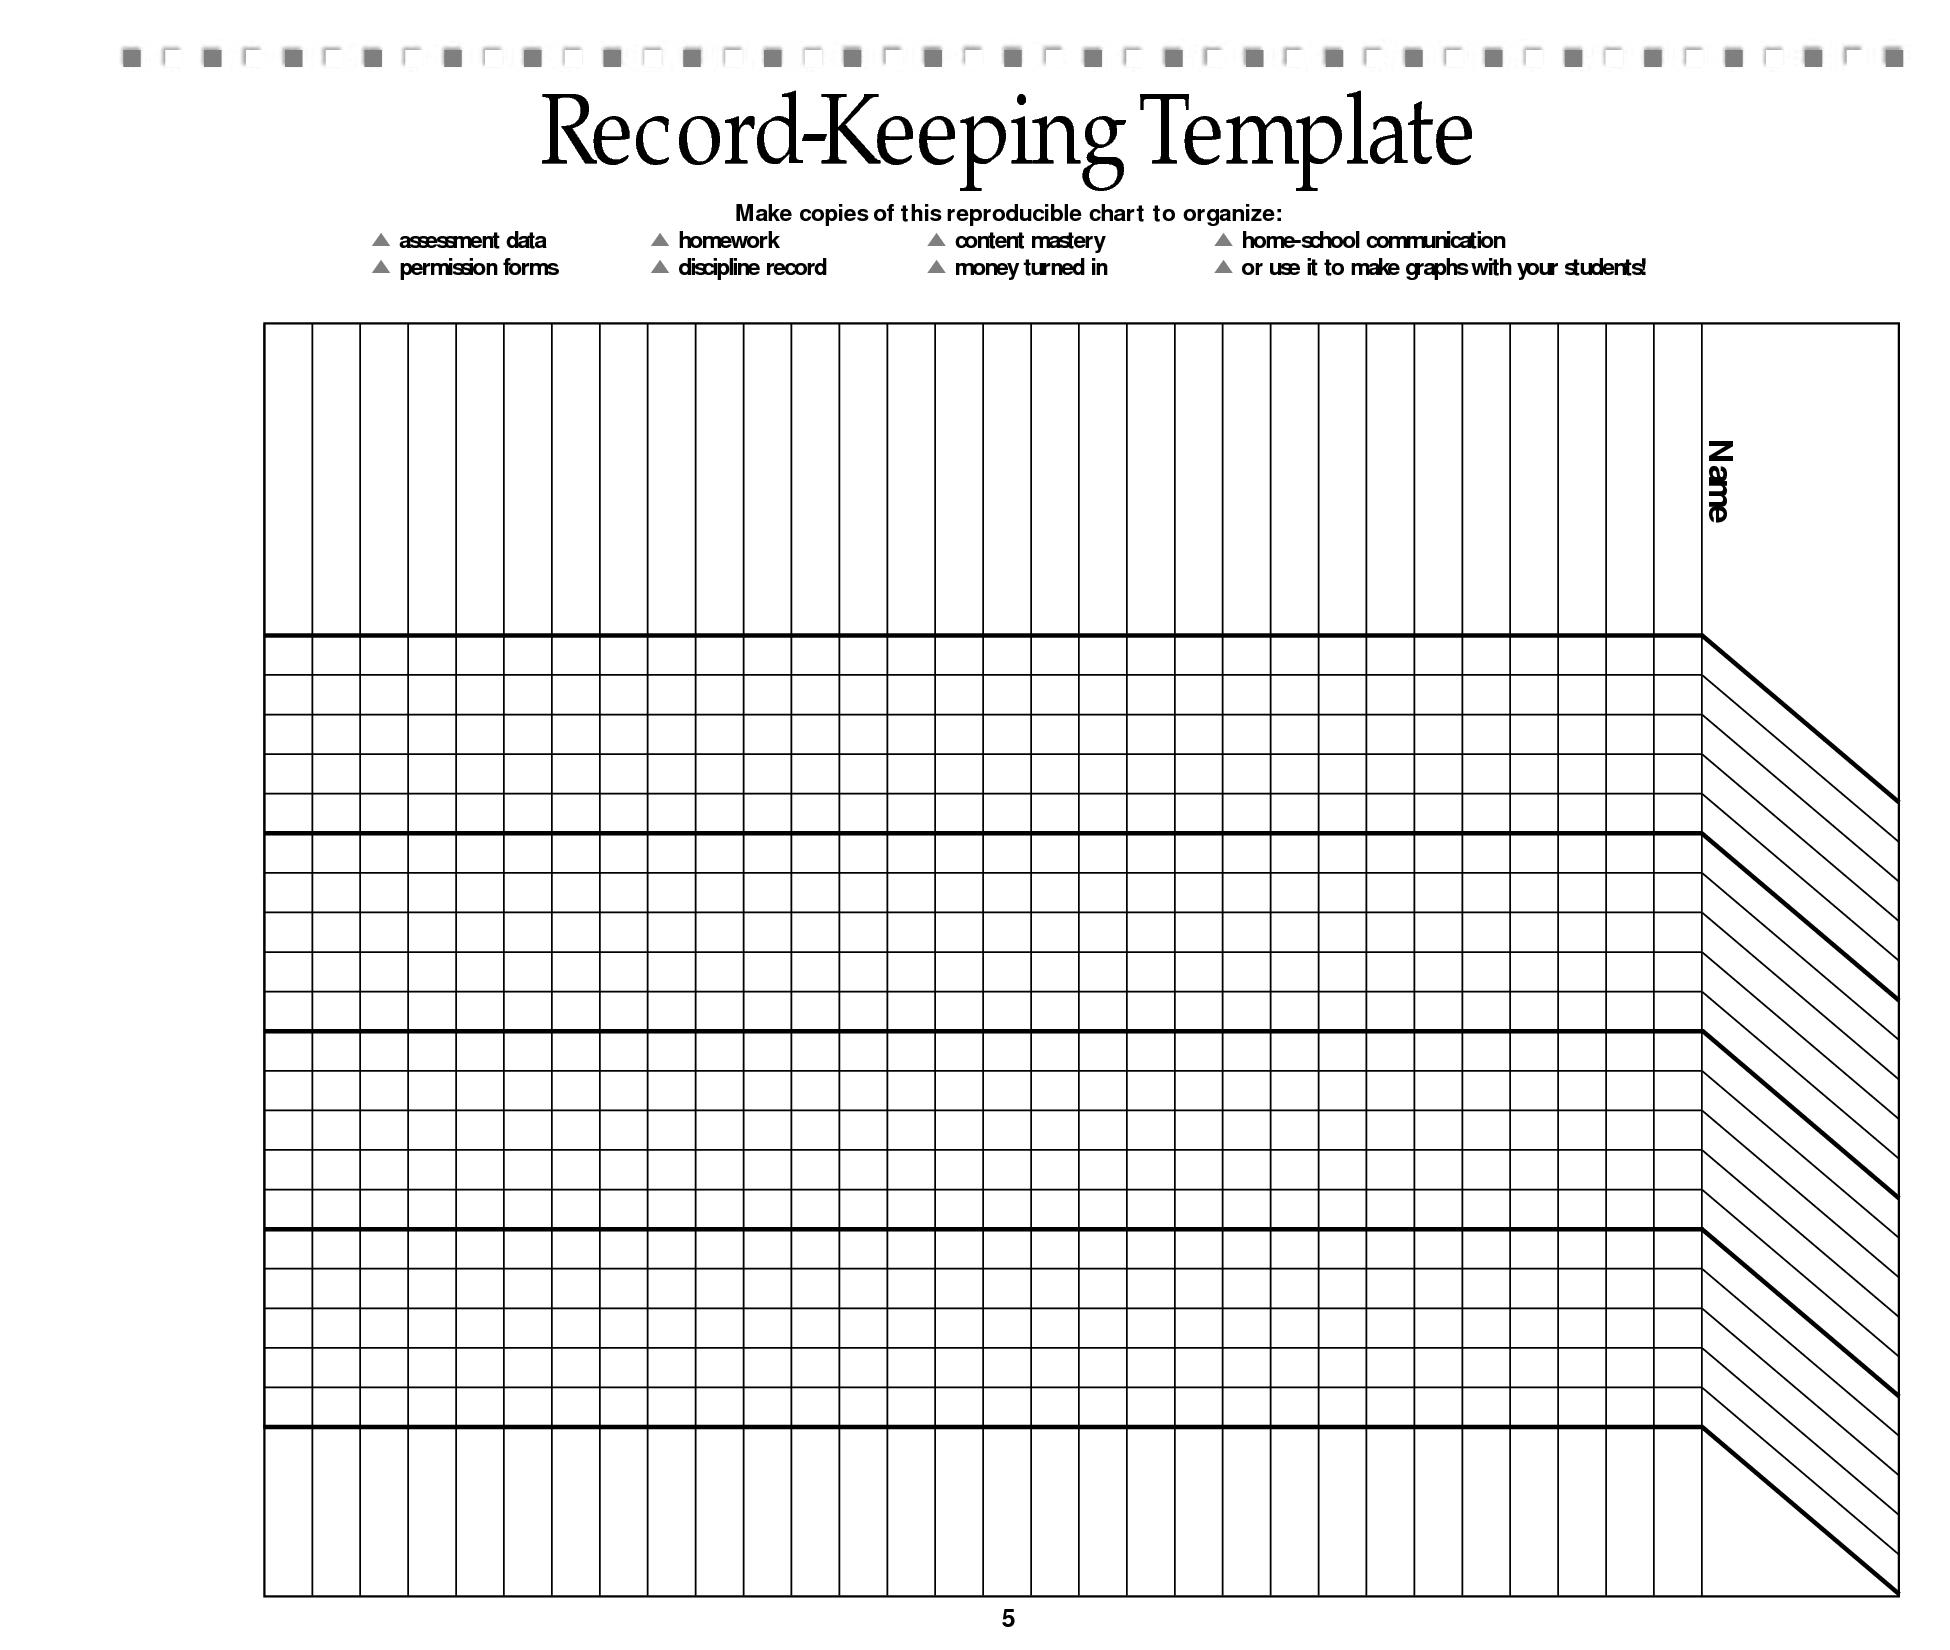 Gratifying image regarding free printable homeschool record keeping forms